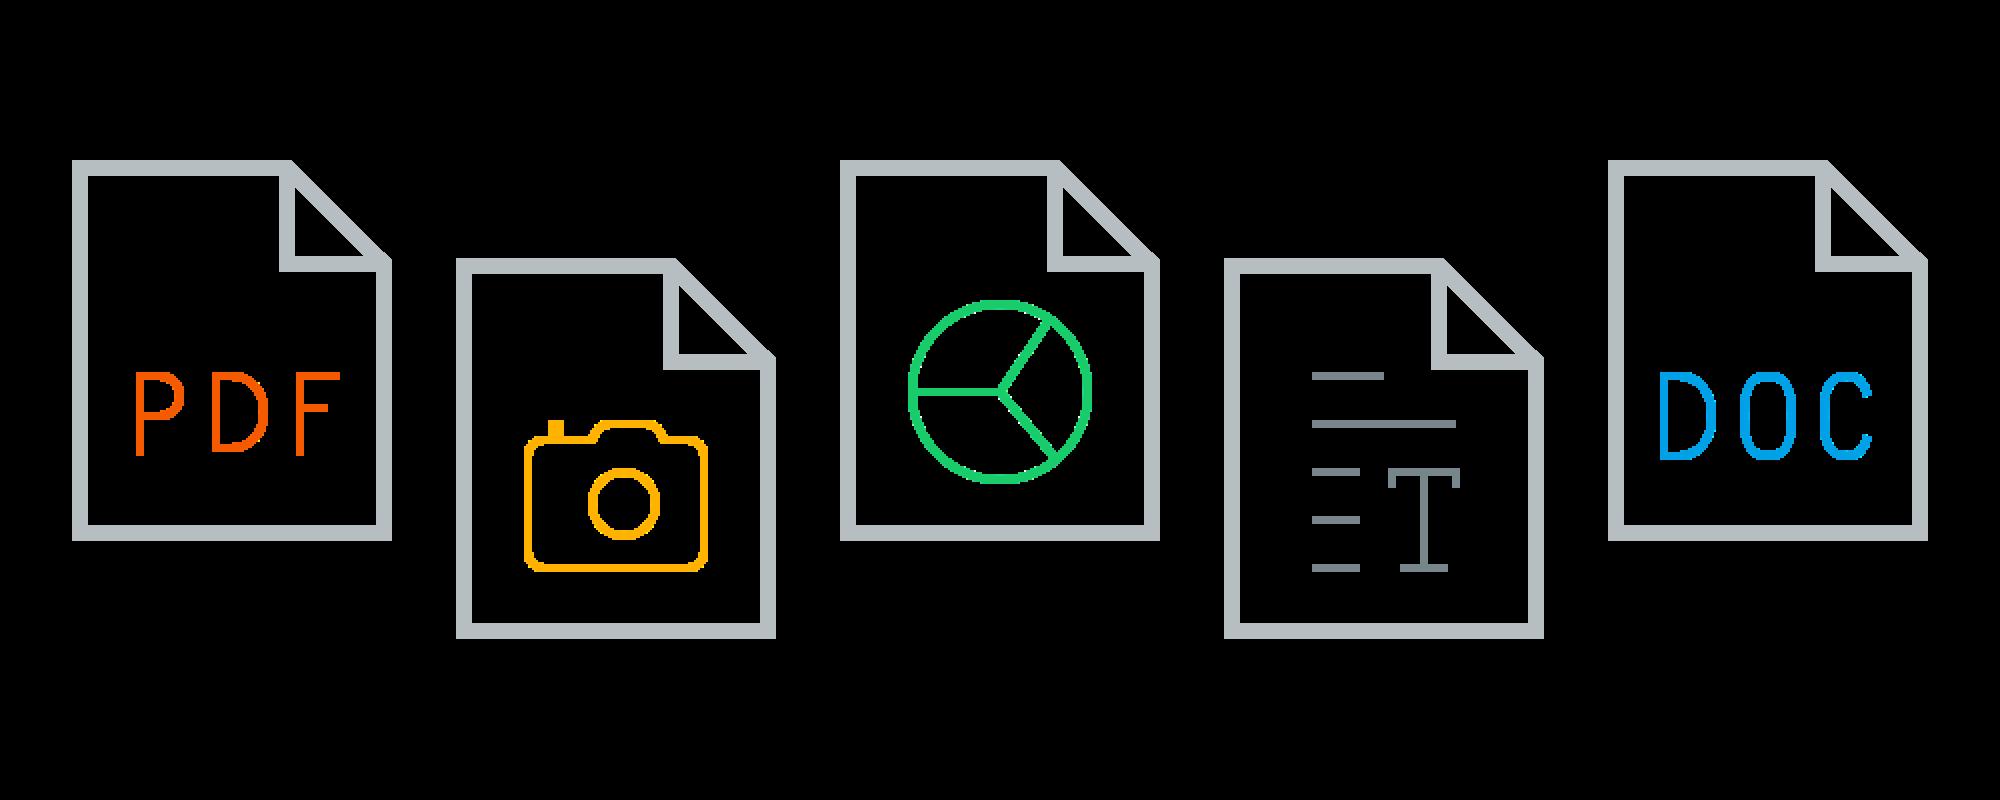 File formats graphic dark